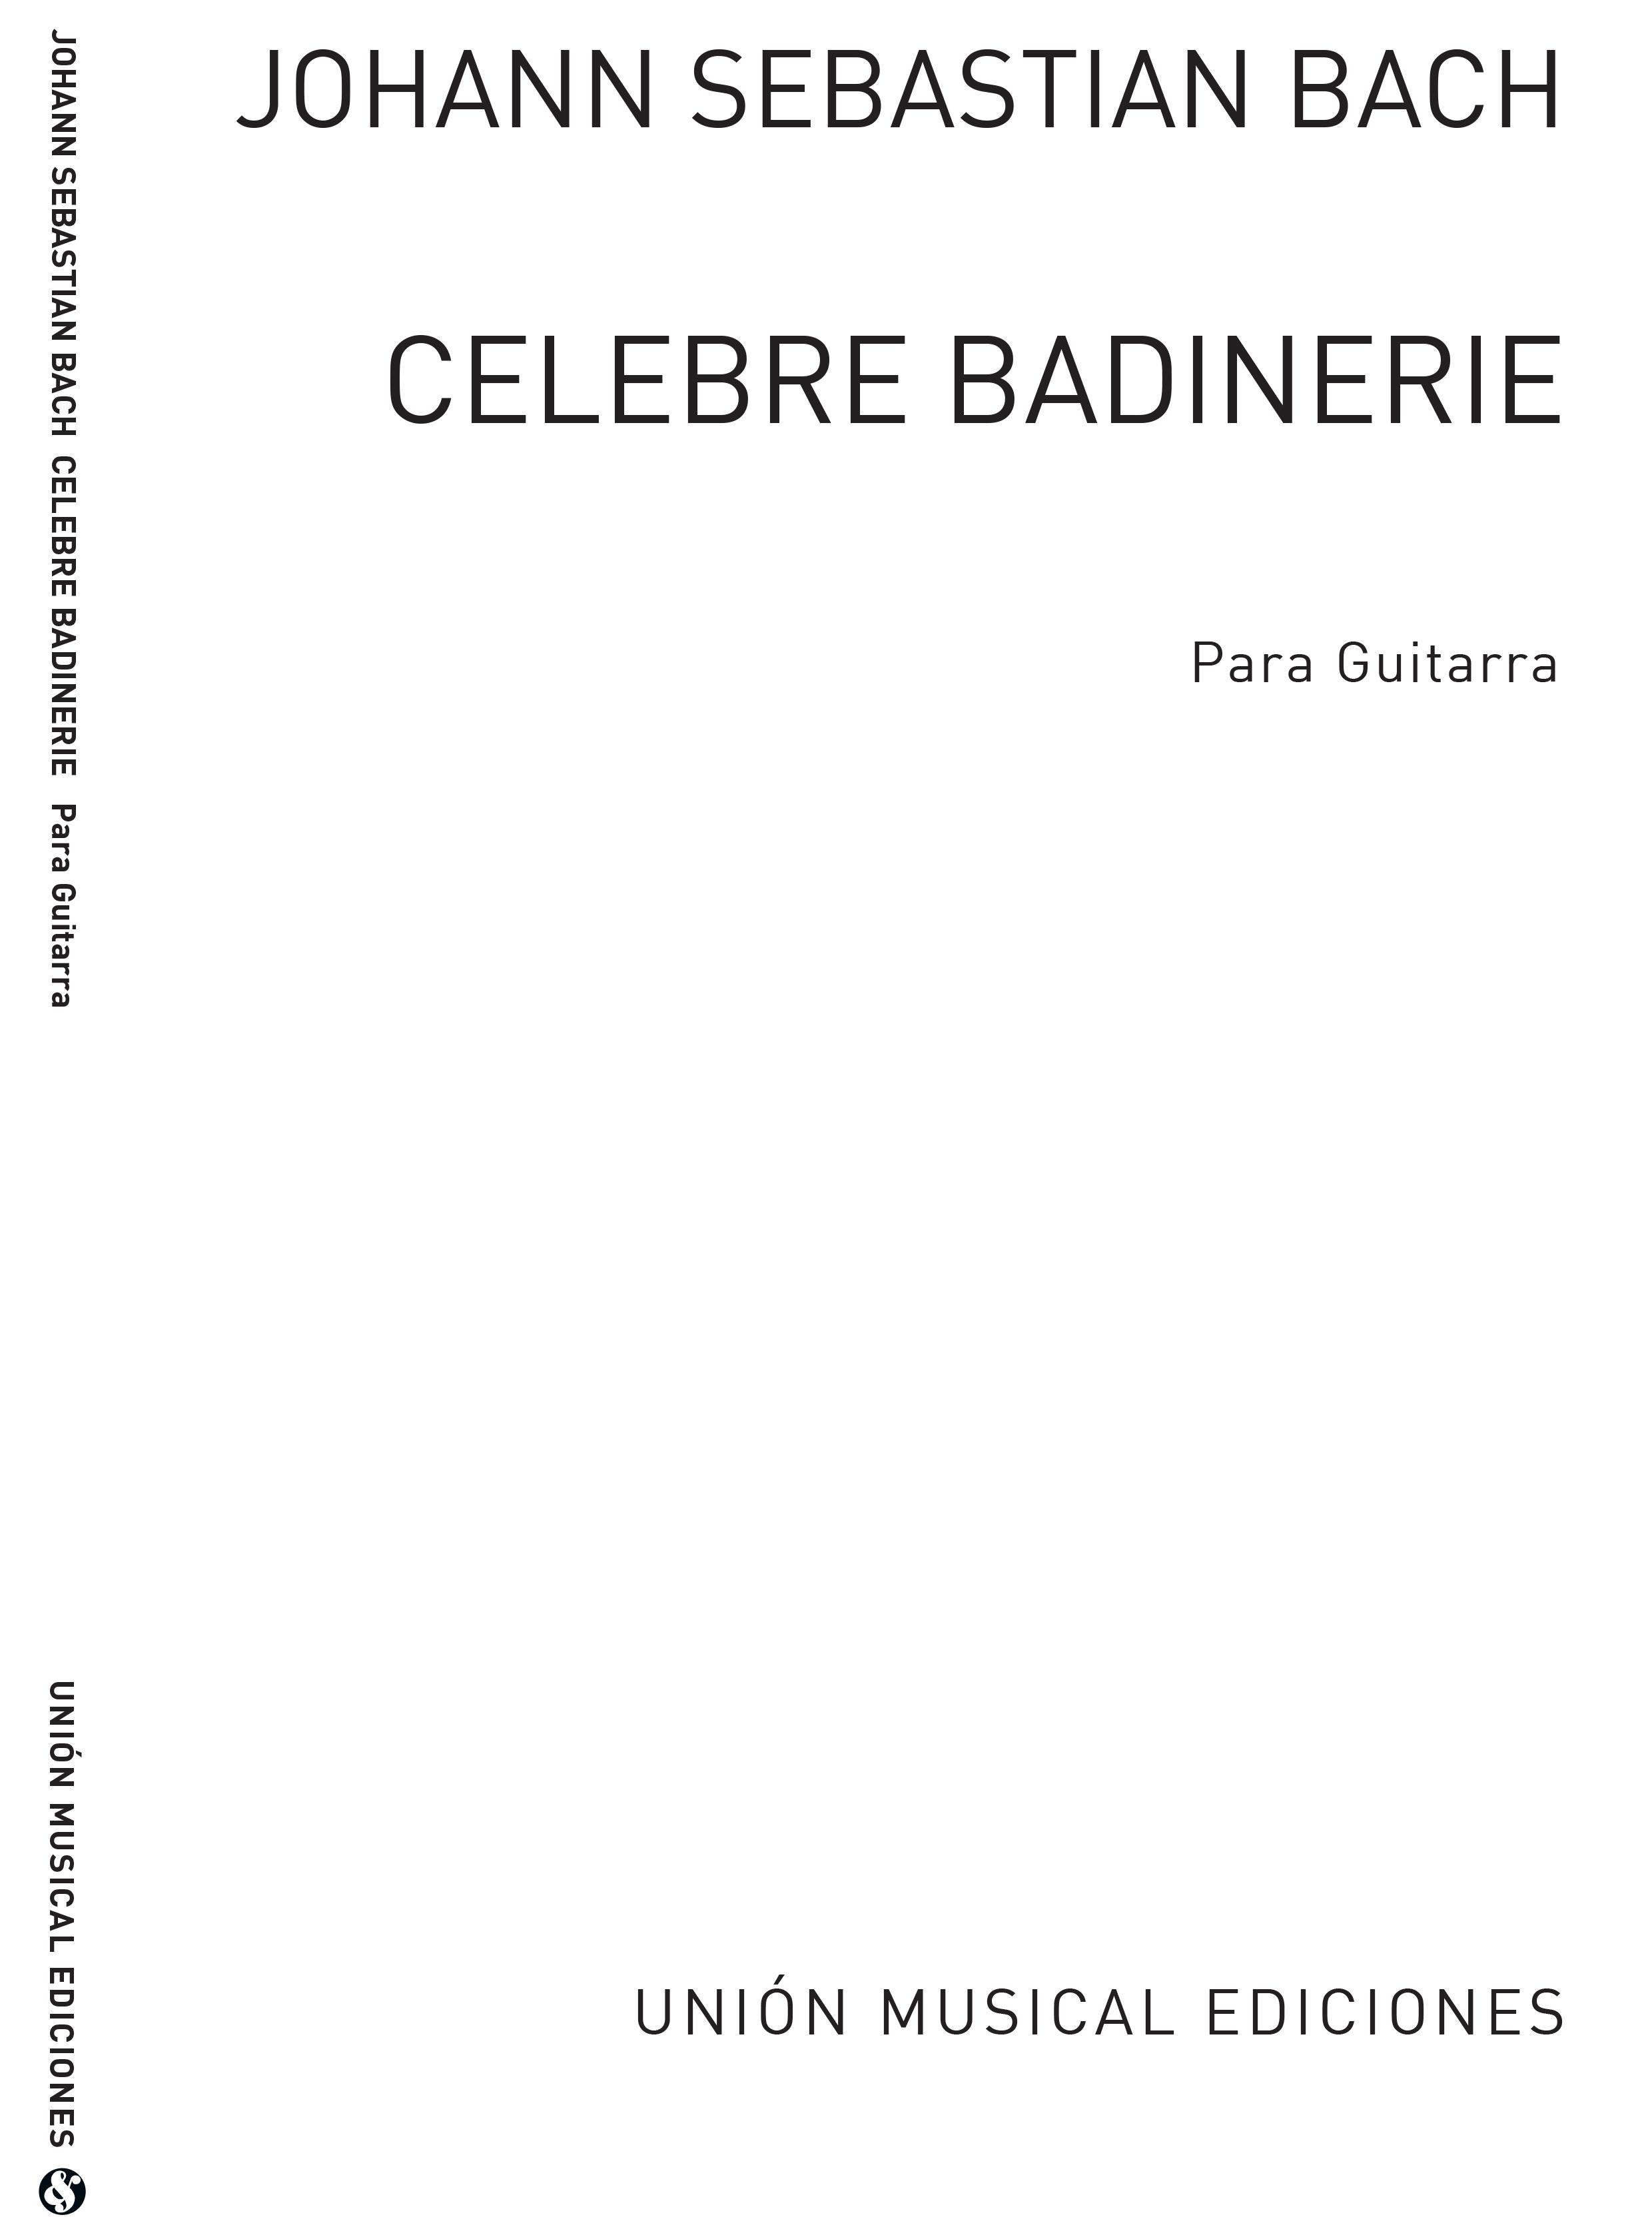 Johann Sebastian Bach: Badinerie: Guitar: Instrumental Work